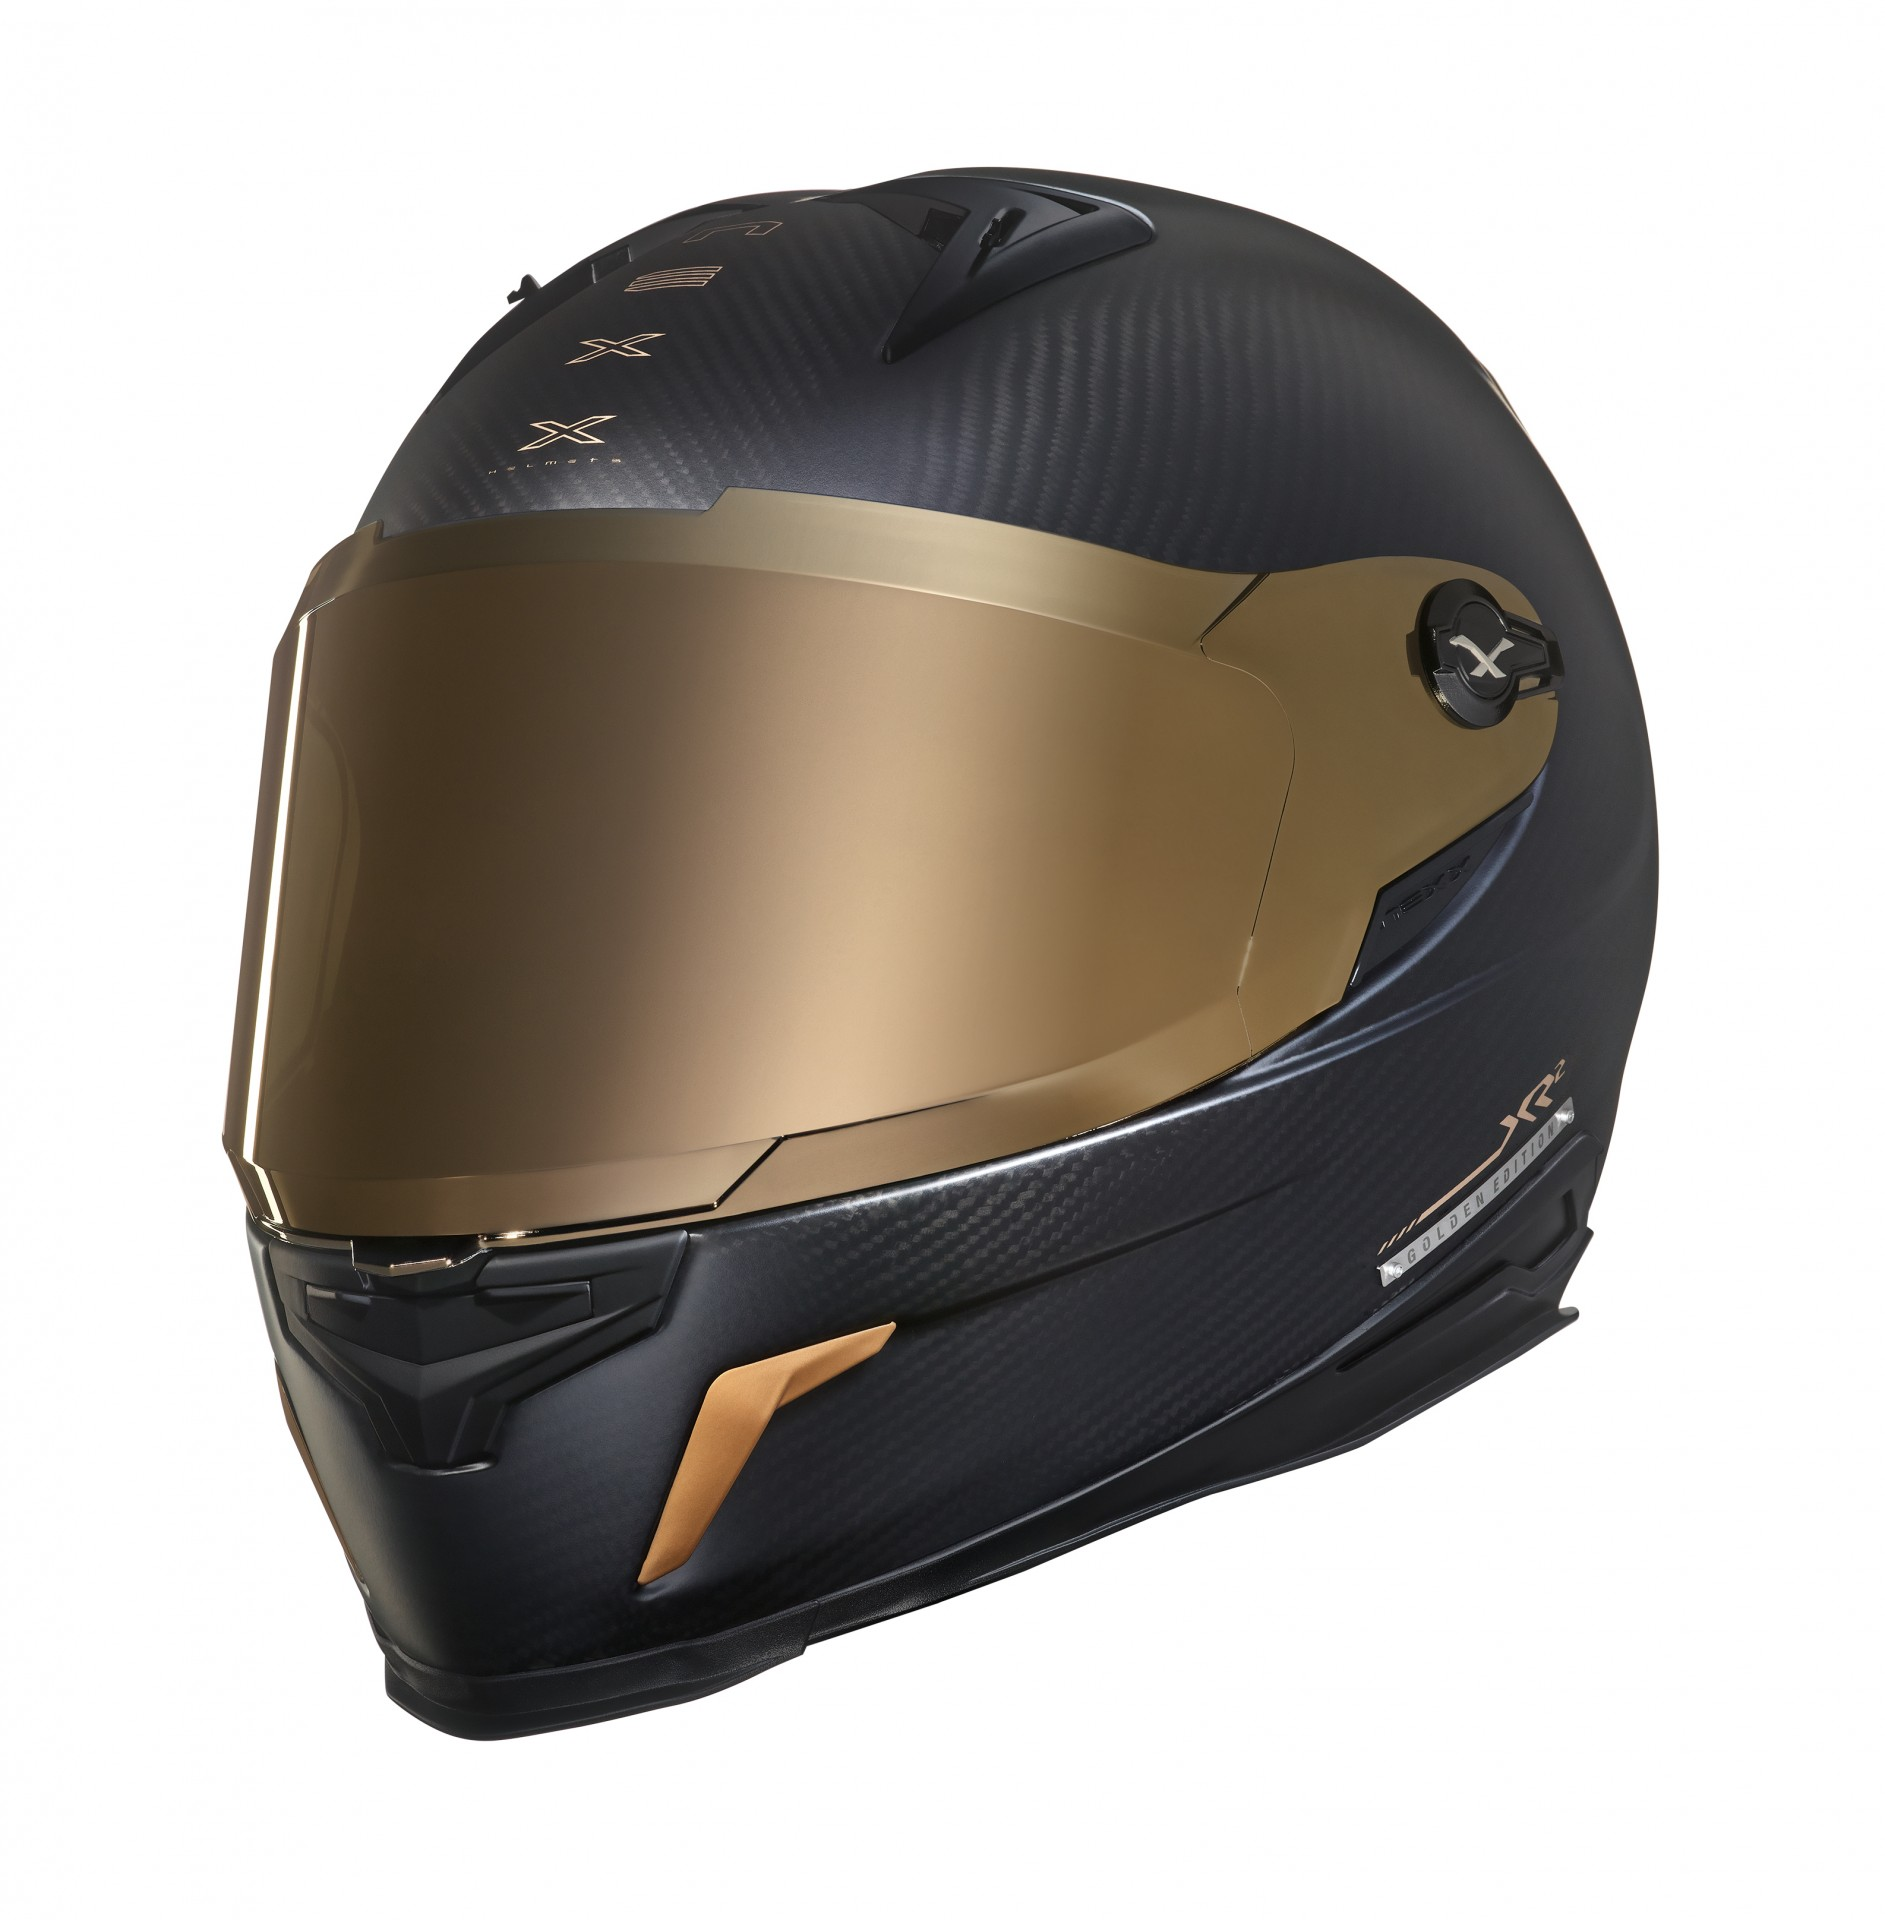 Capacete Nexx X.R2 Golden Edition